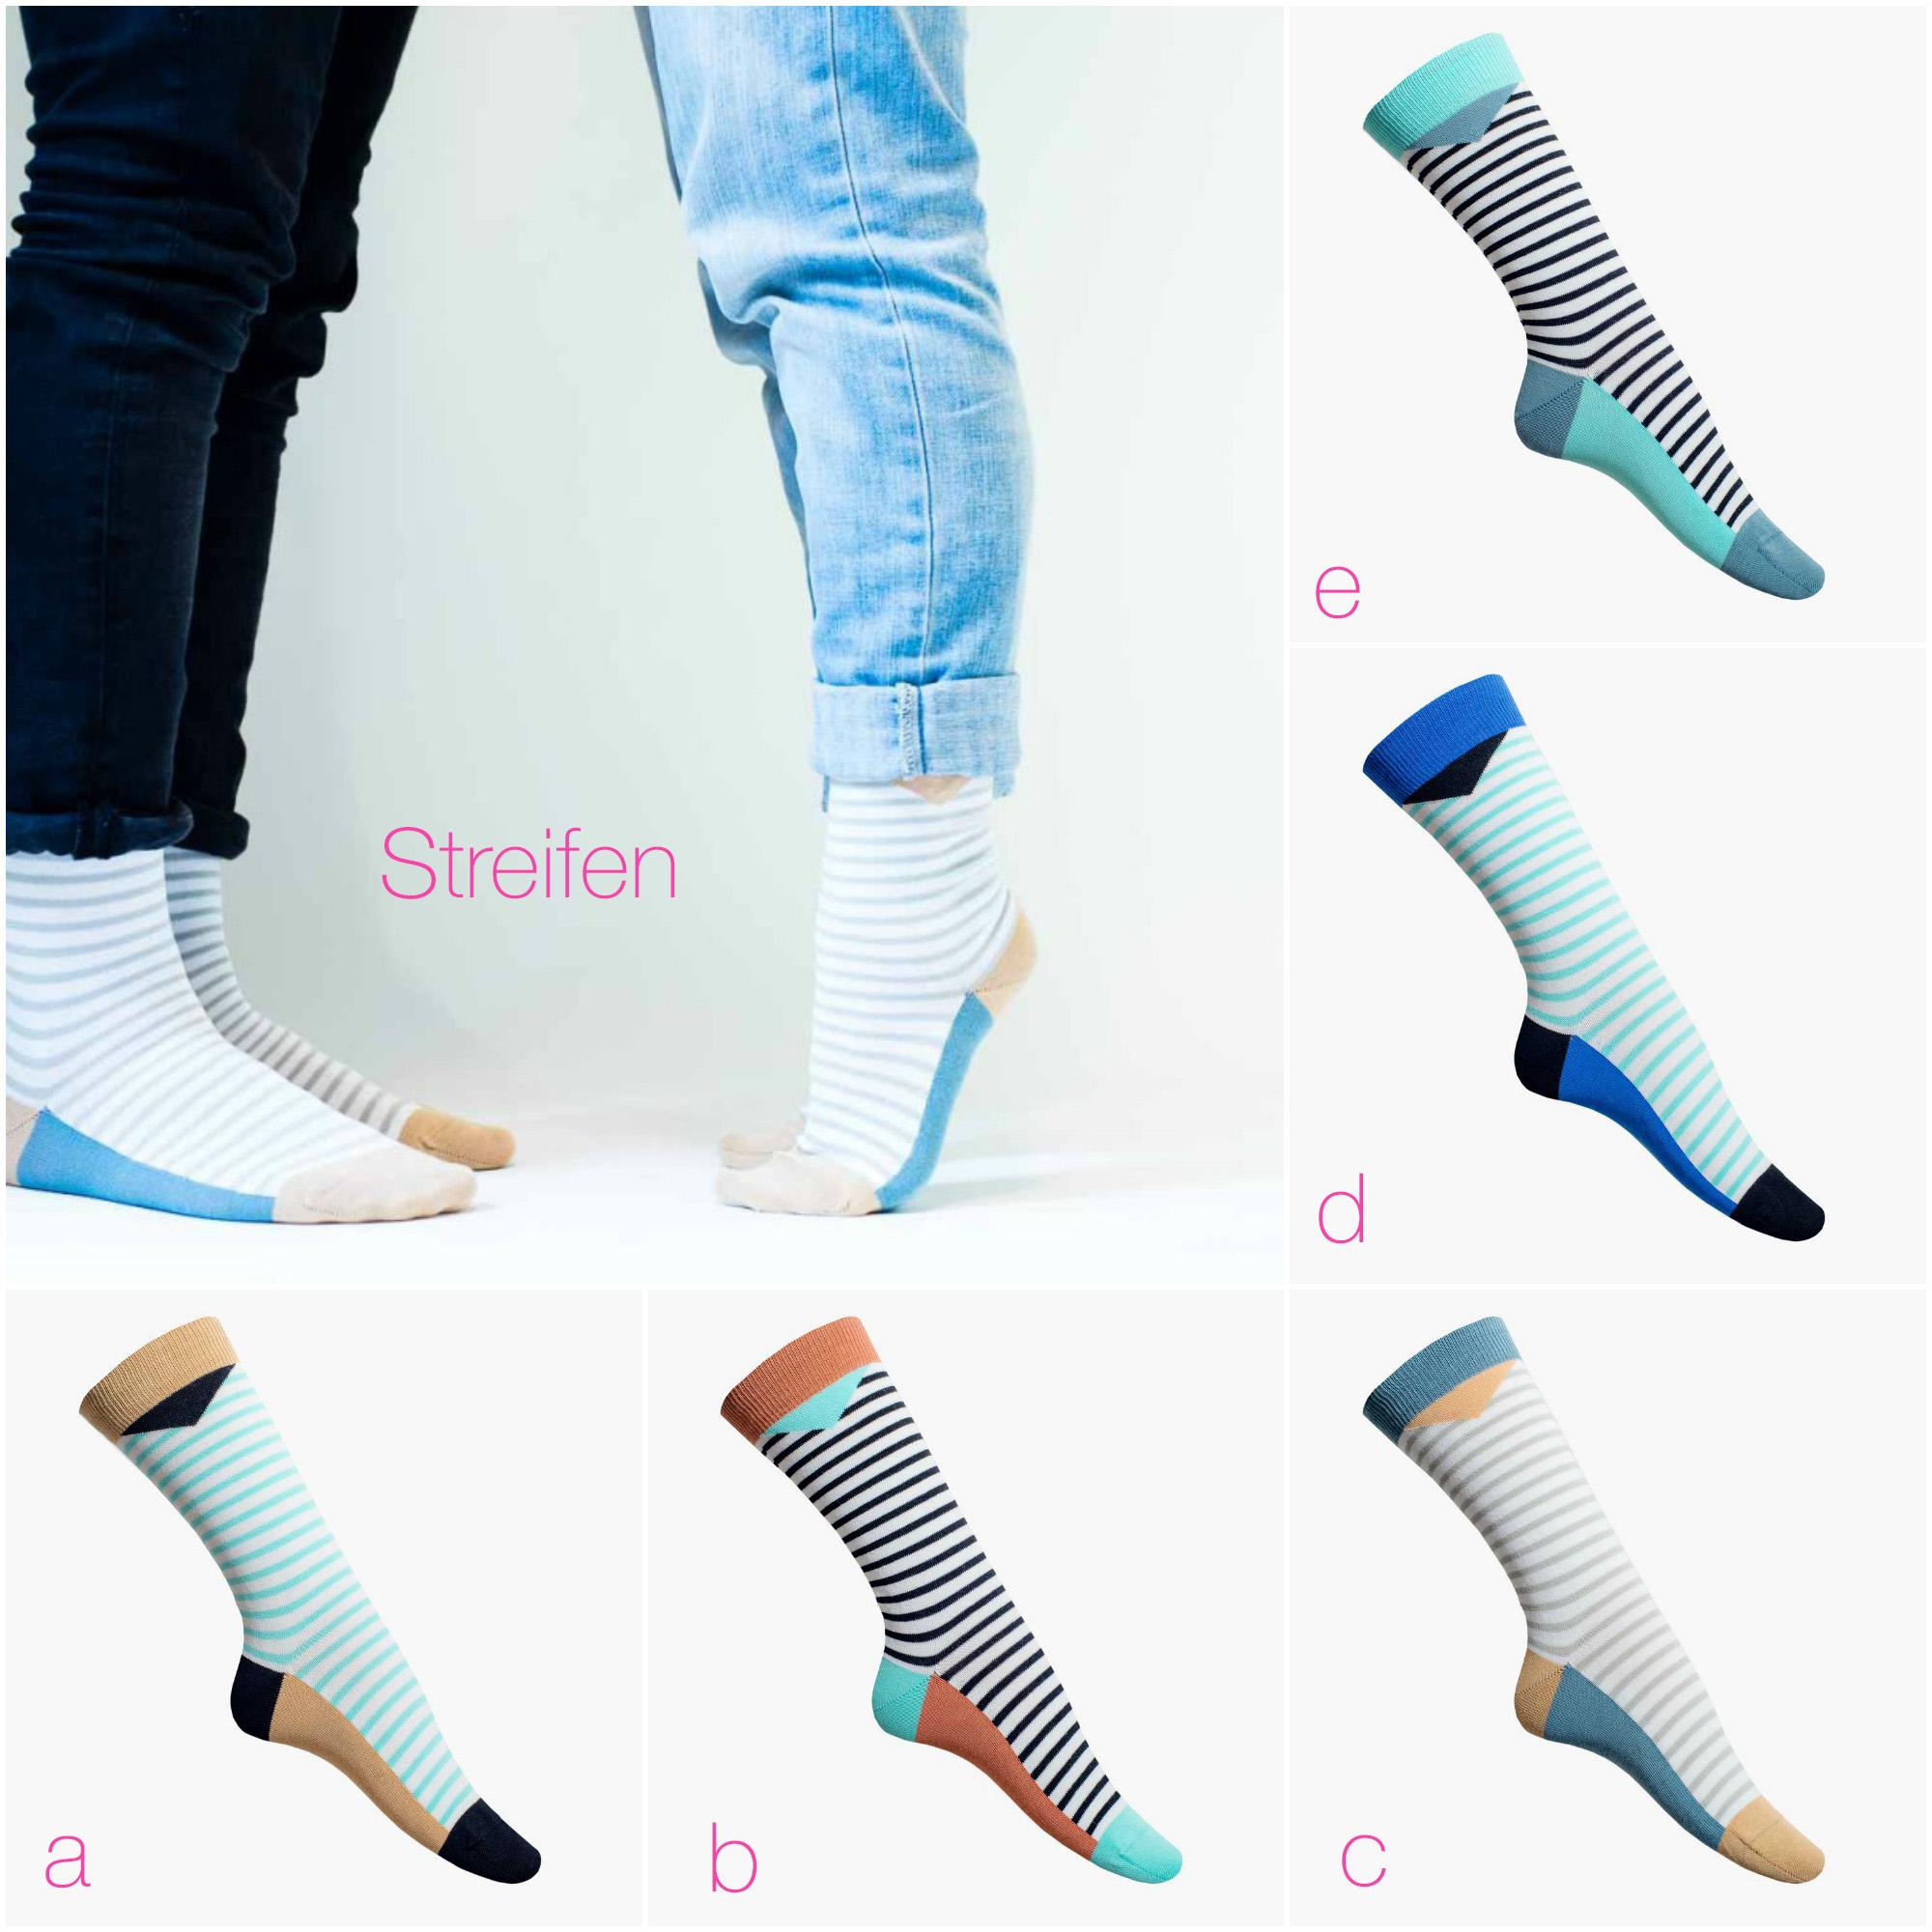 Streifen Socken Nice Nice Nice Giveaway Pinkepank